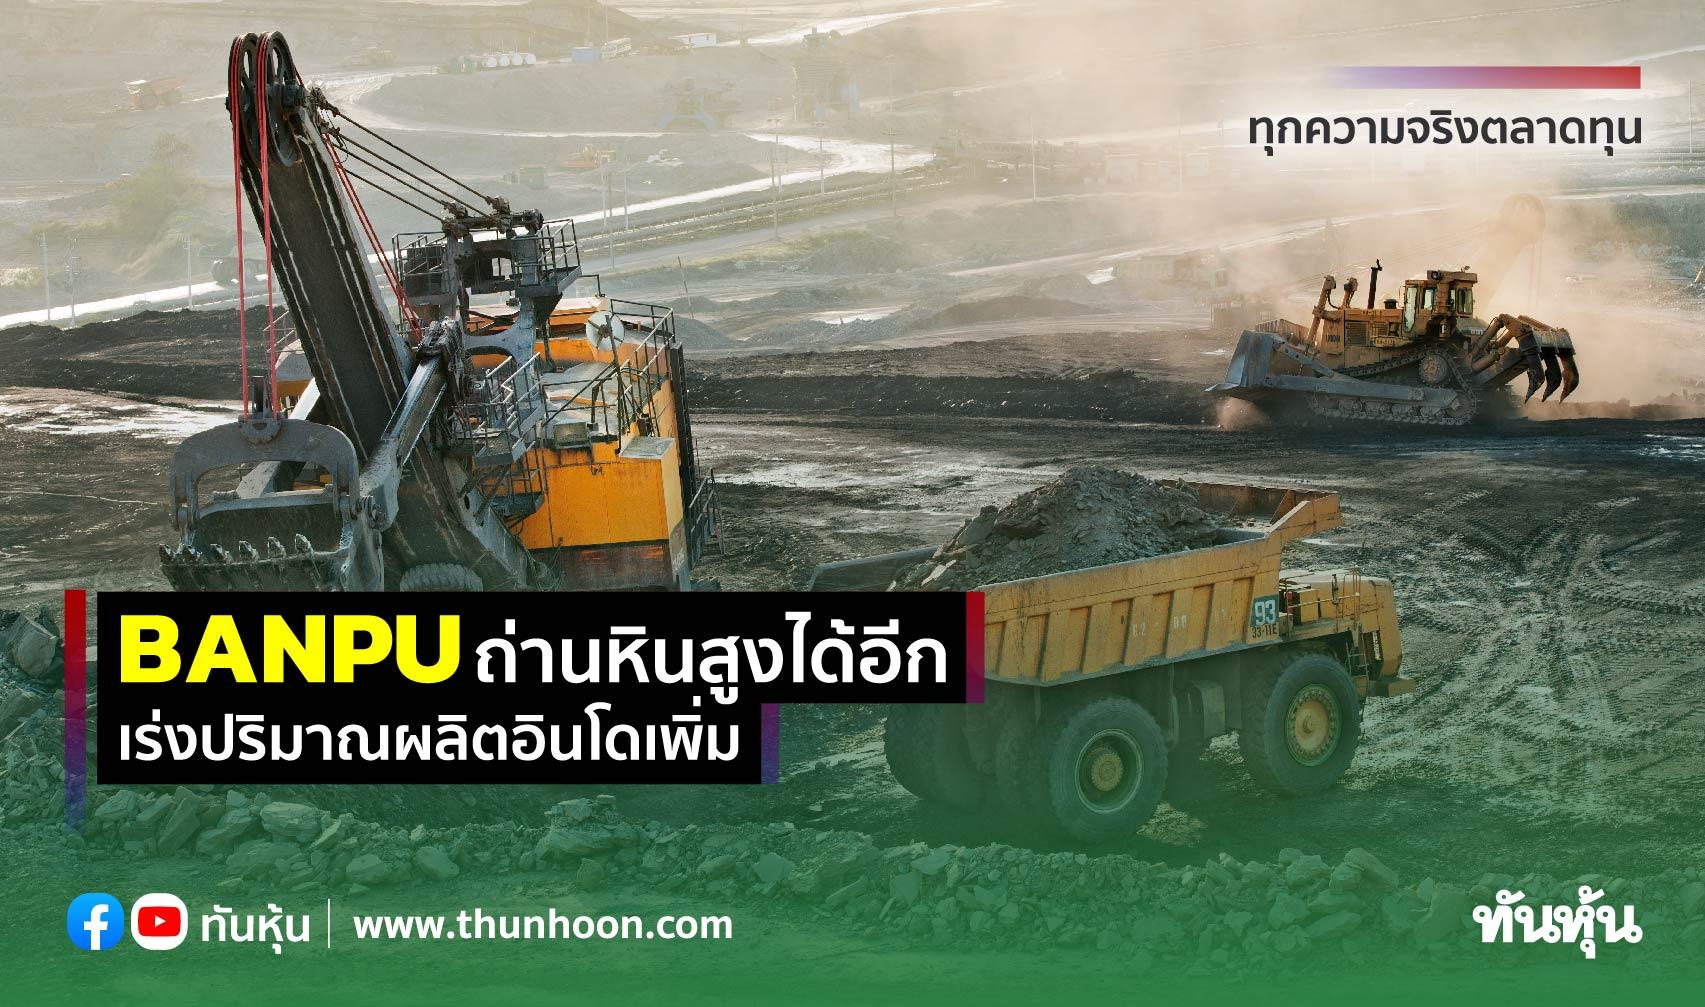 BANPUถ่านหินสูงได้อีก เร่งปริมาณผลิตอินโดเพิ่ม